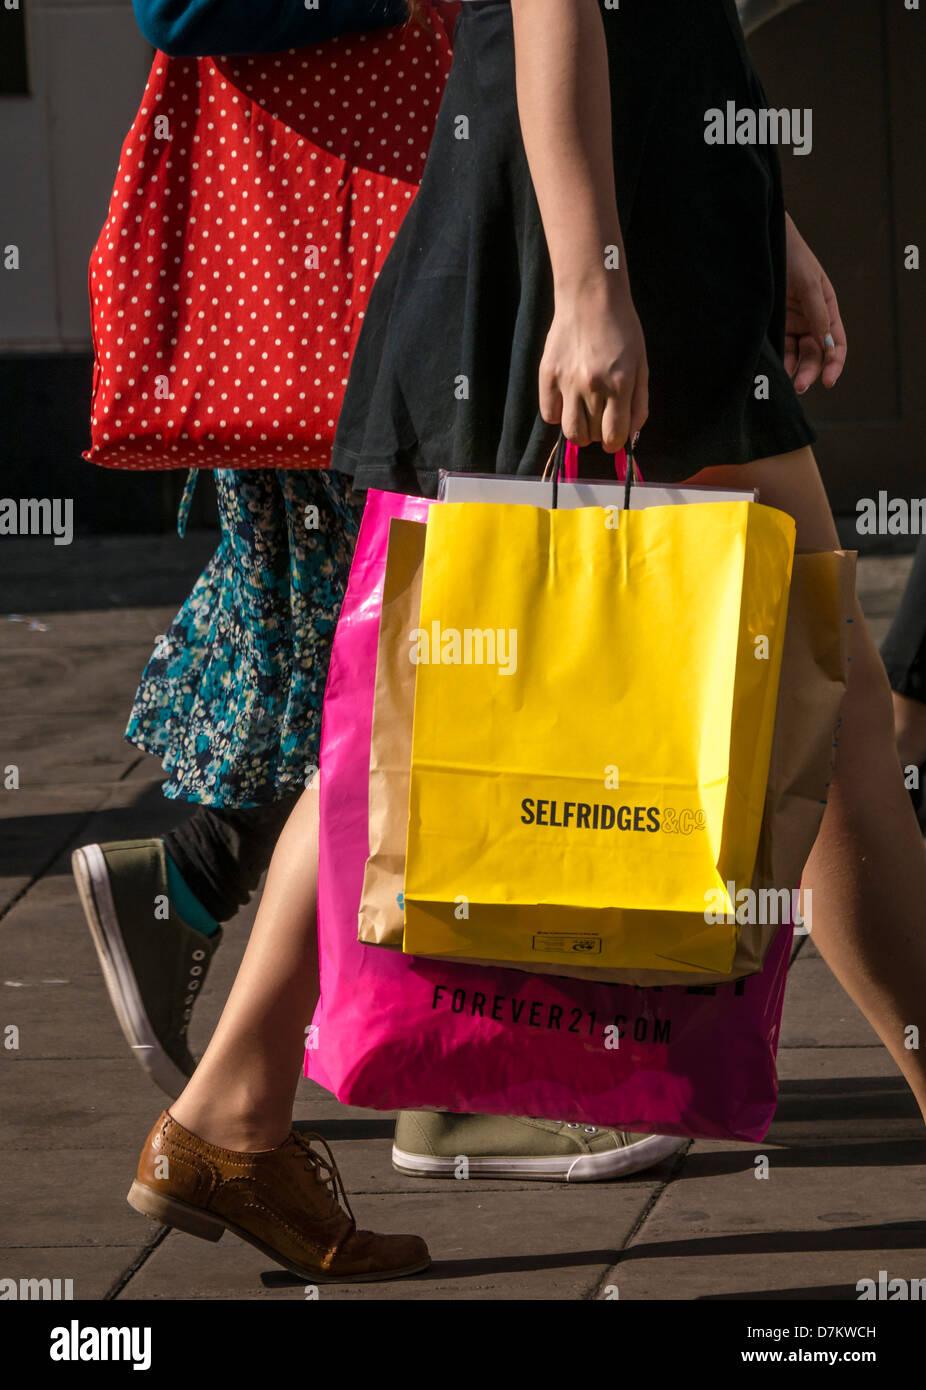 Woman holding Selfridges Shopping bag - Stock Image